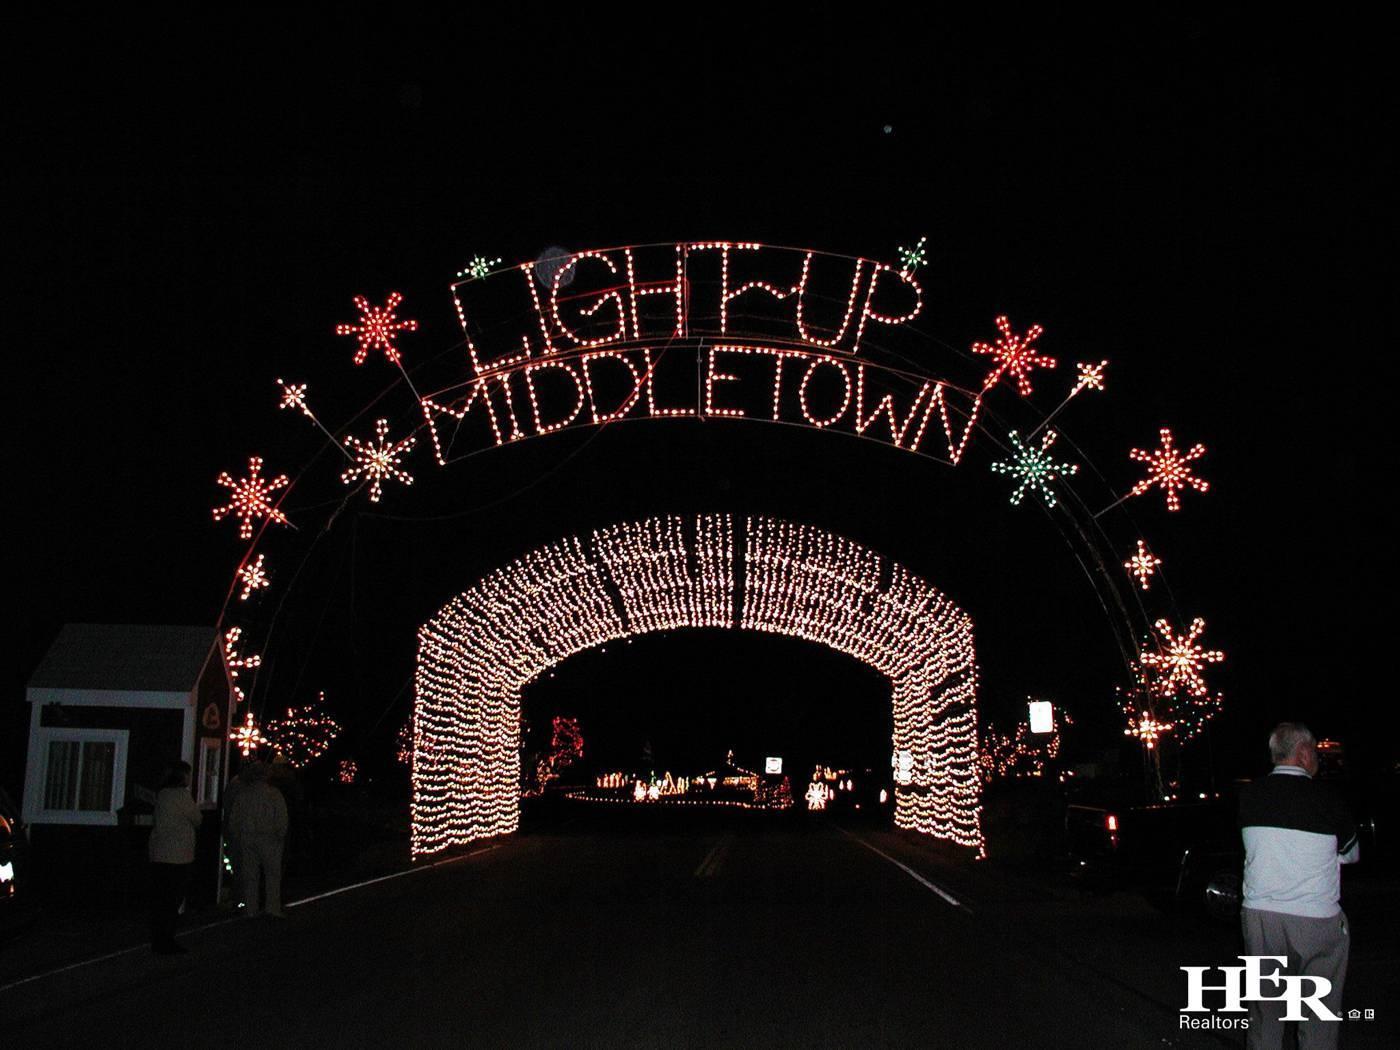 Middletown's holiday season lights